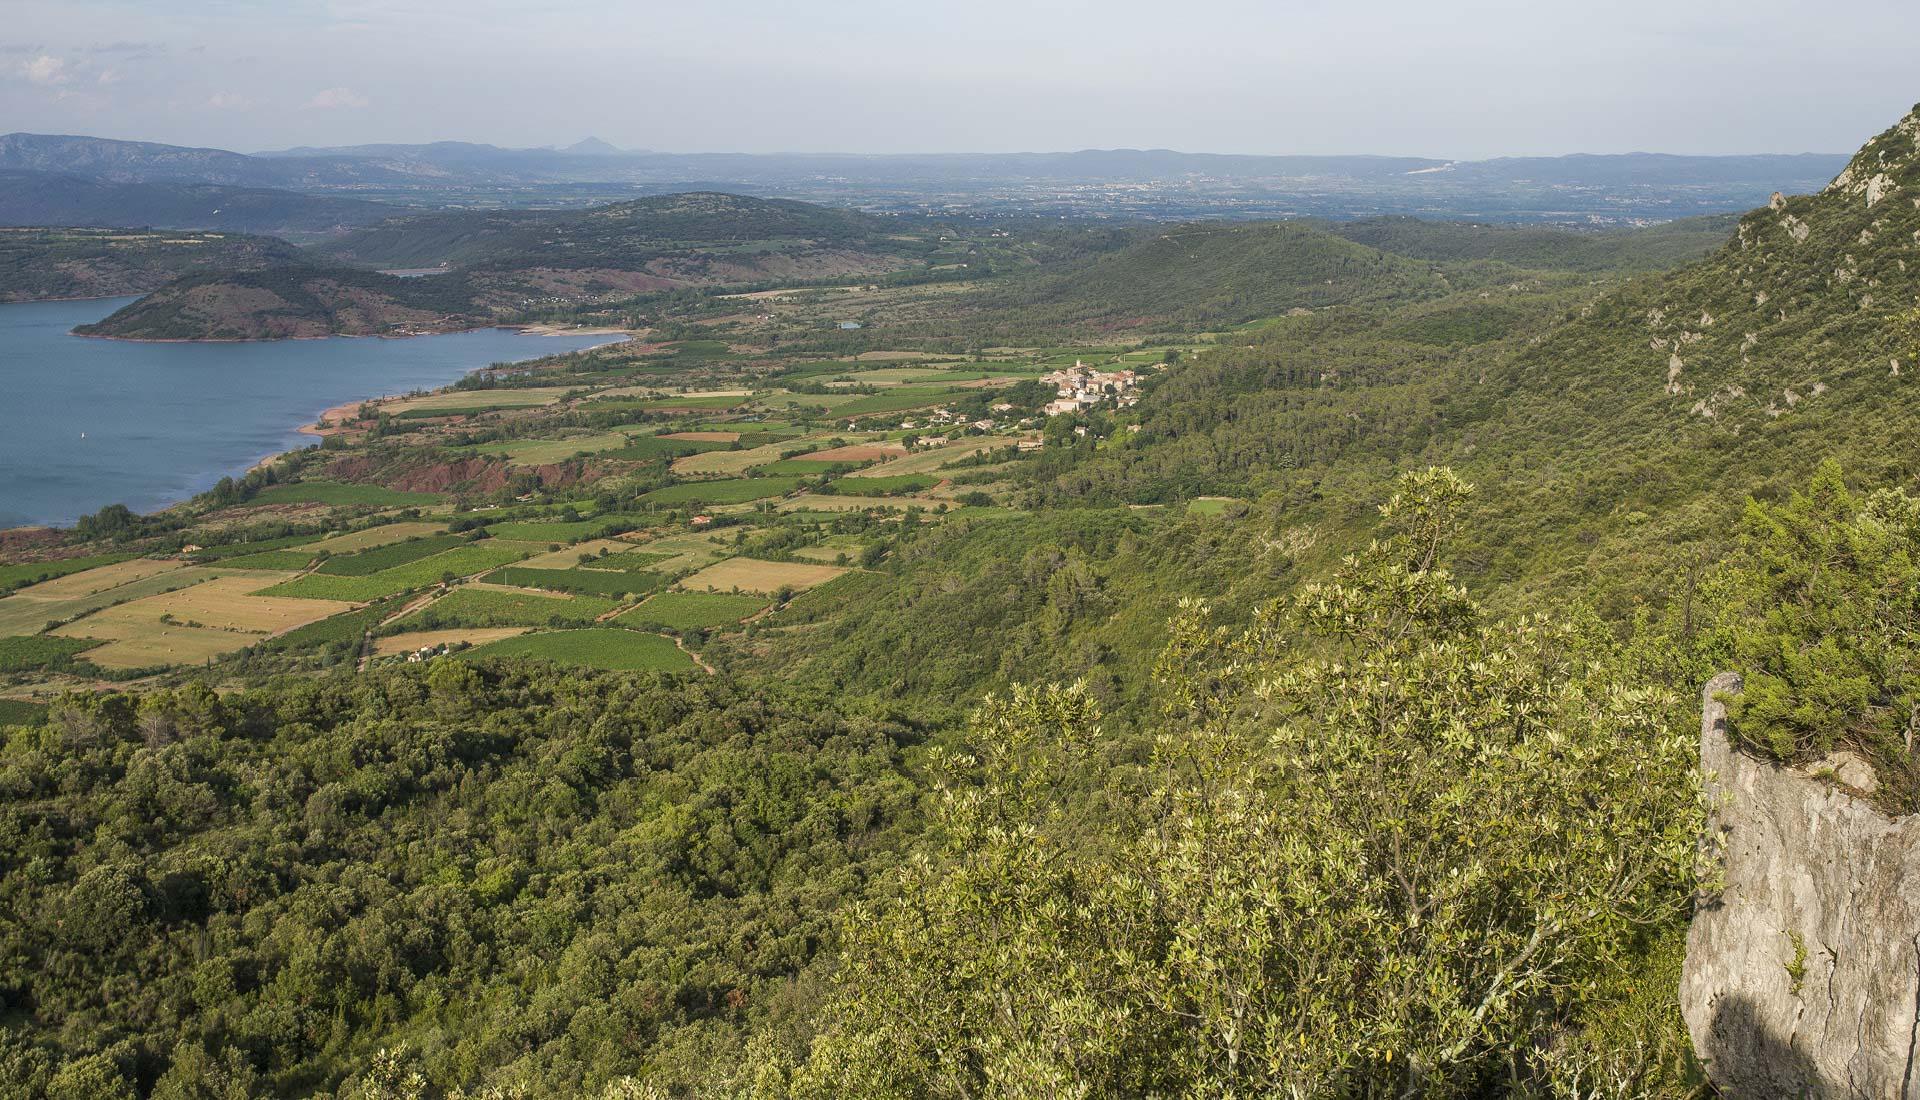 Montagne de Liausson © Christian Ferrer:Wikimedia Commons